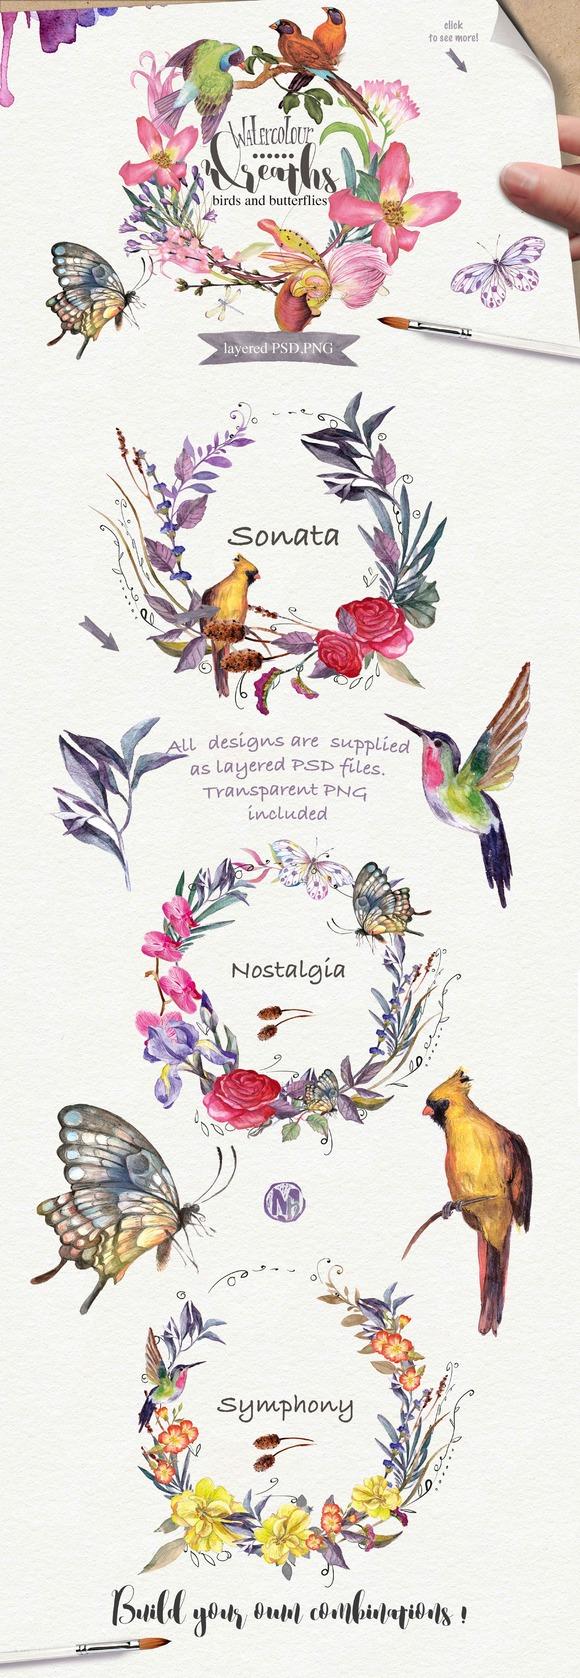 Watercolor floral wreaths vol.2 - Illustrations